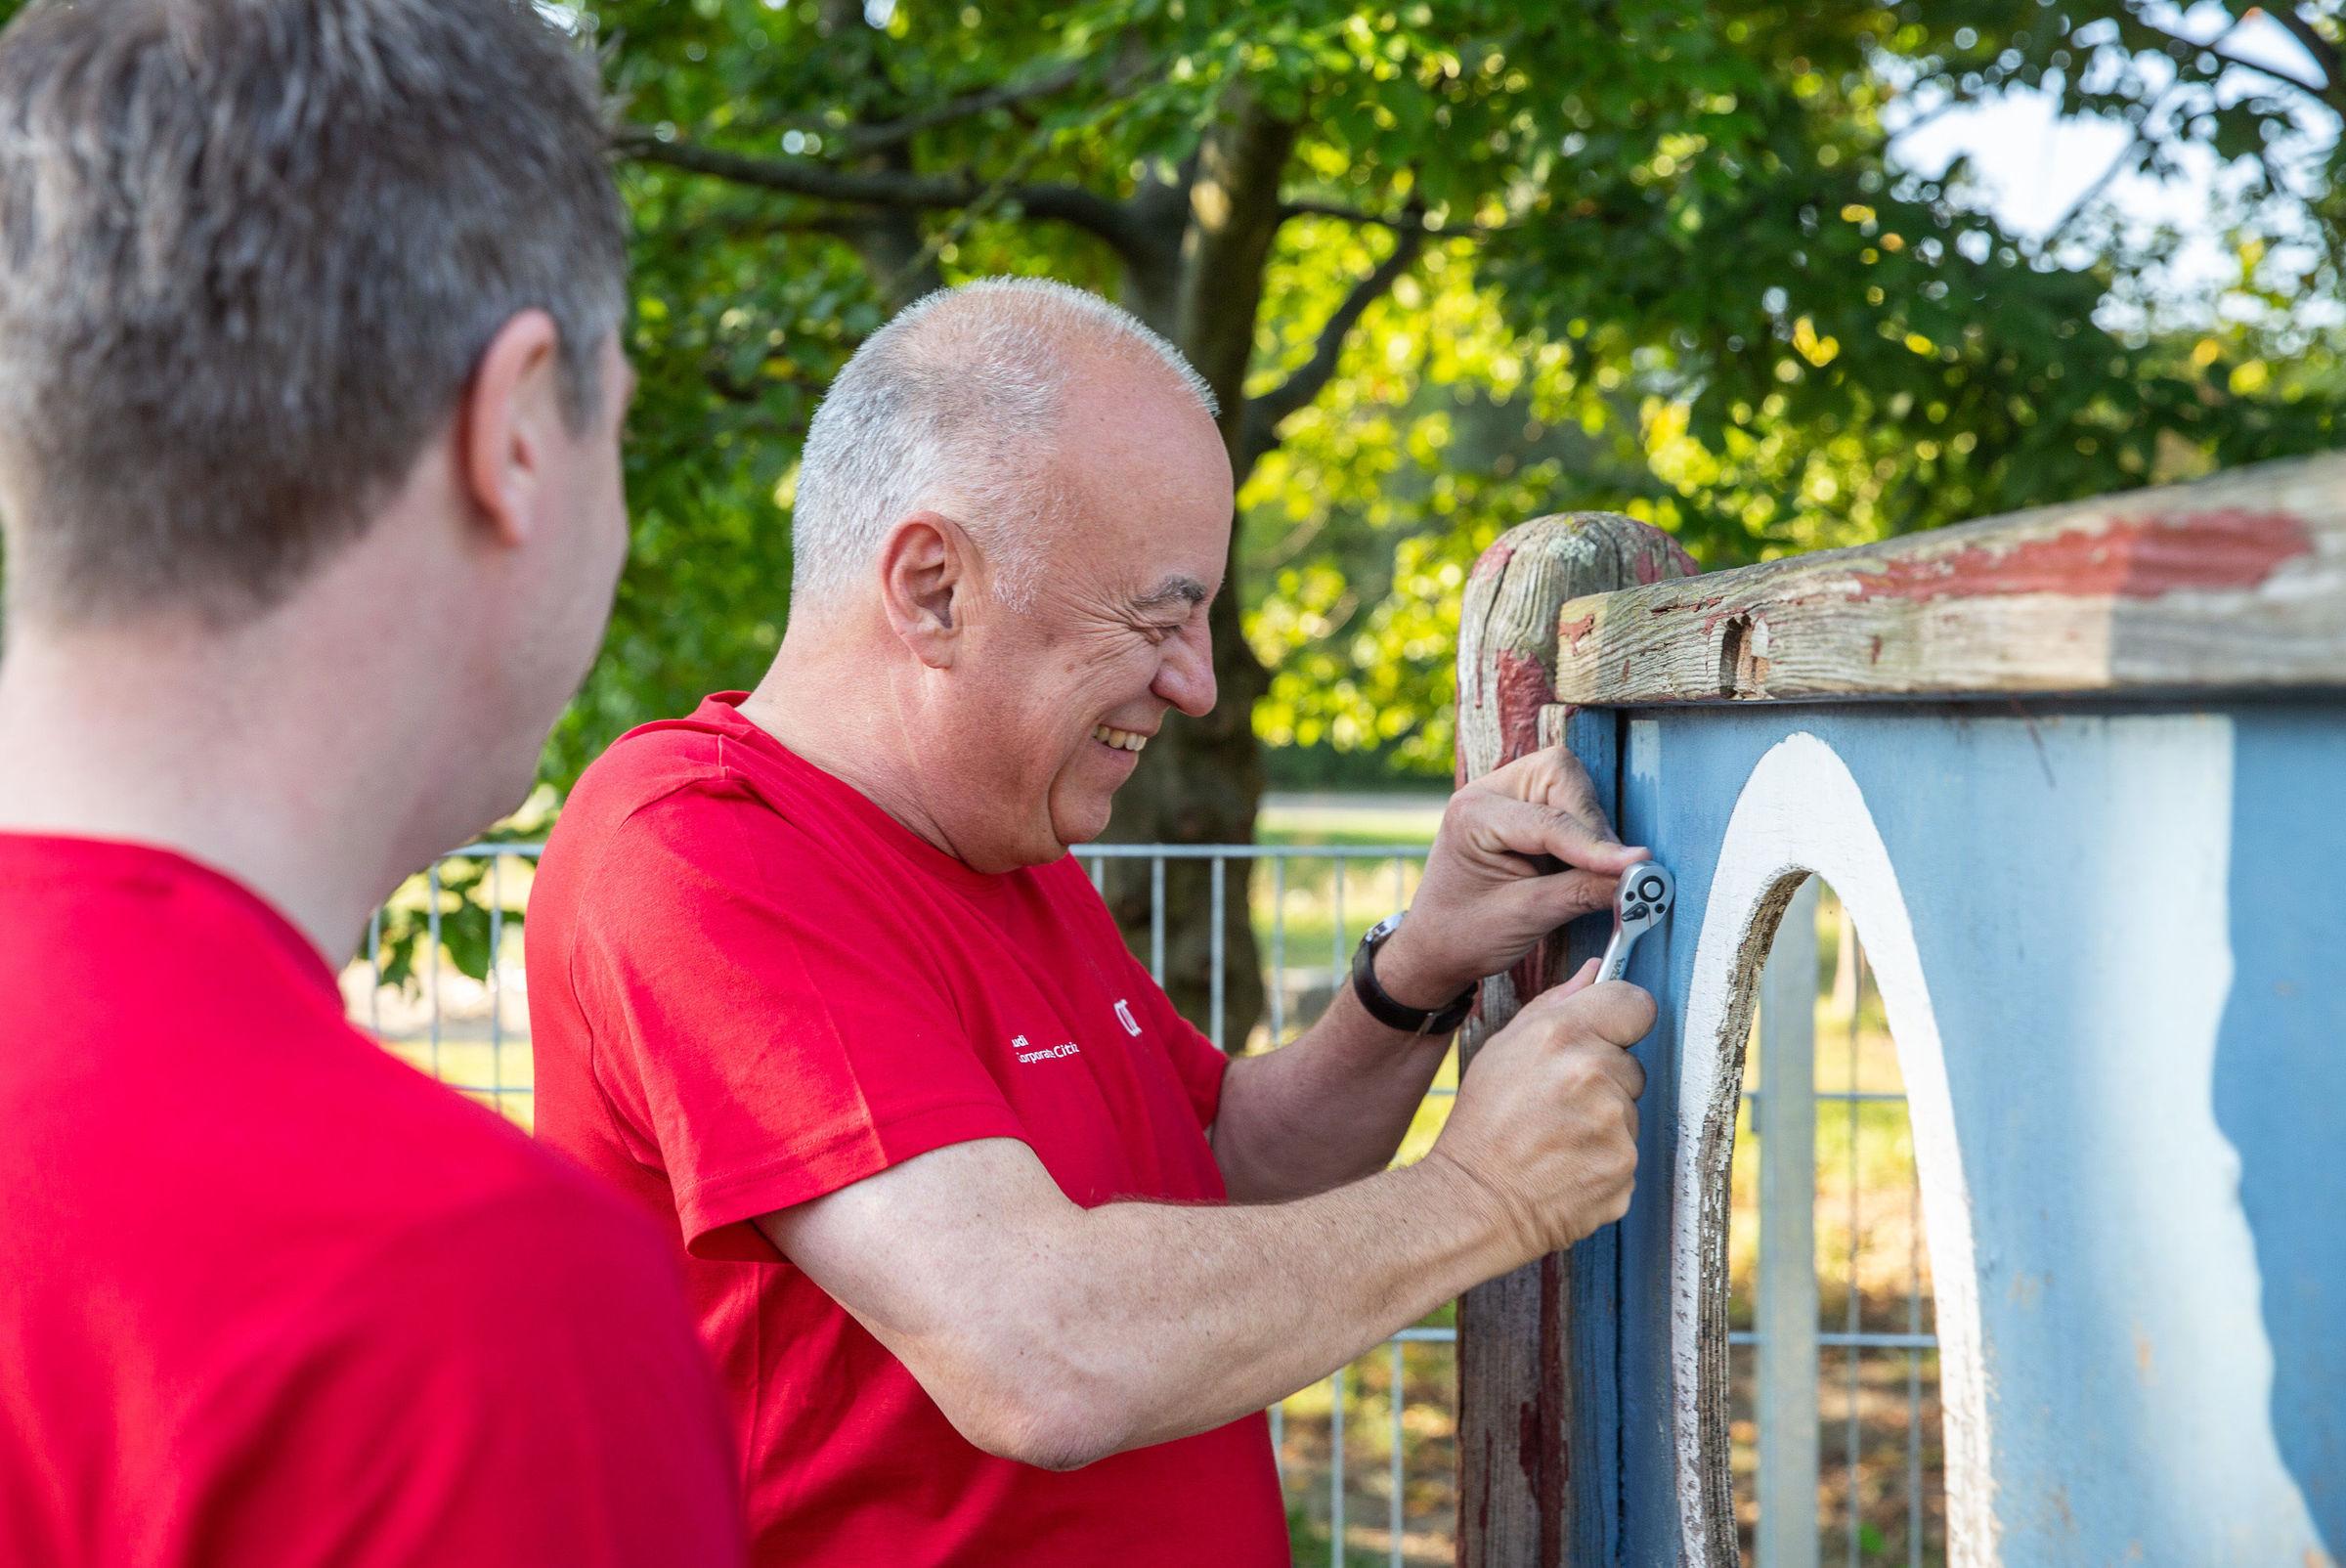 Audi Volunteer Day 2021, digital and analog: employees help in Ingolstadt and Neckarsulm - Image 3